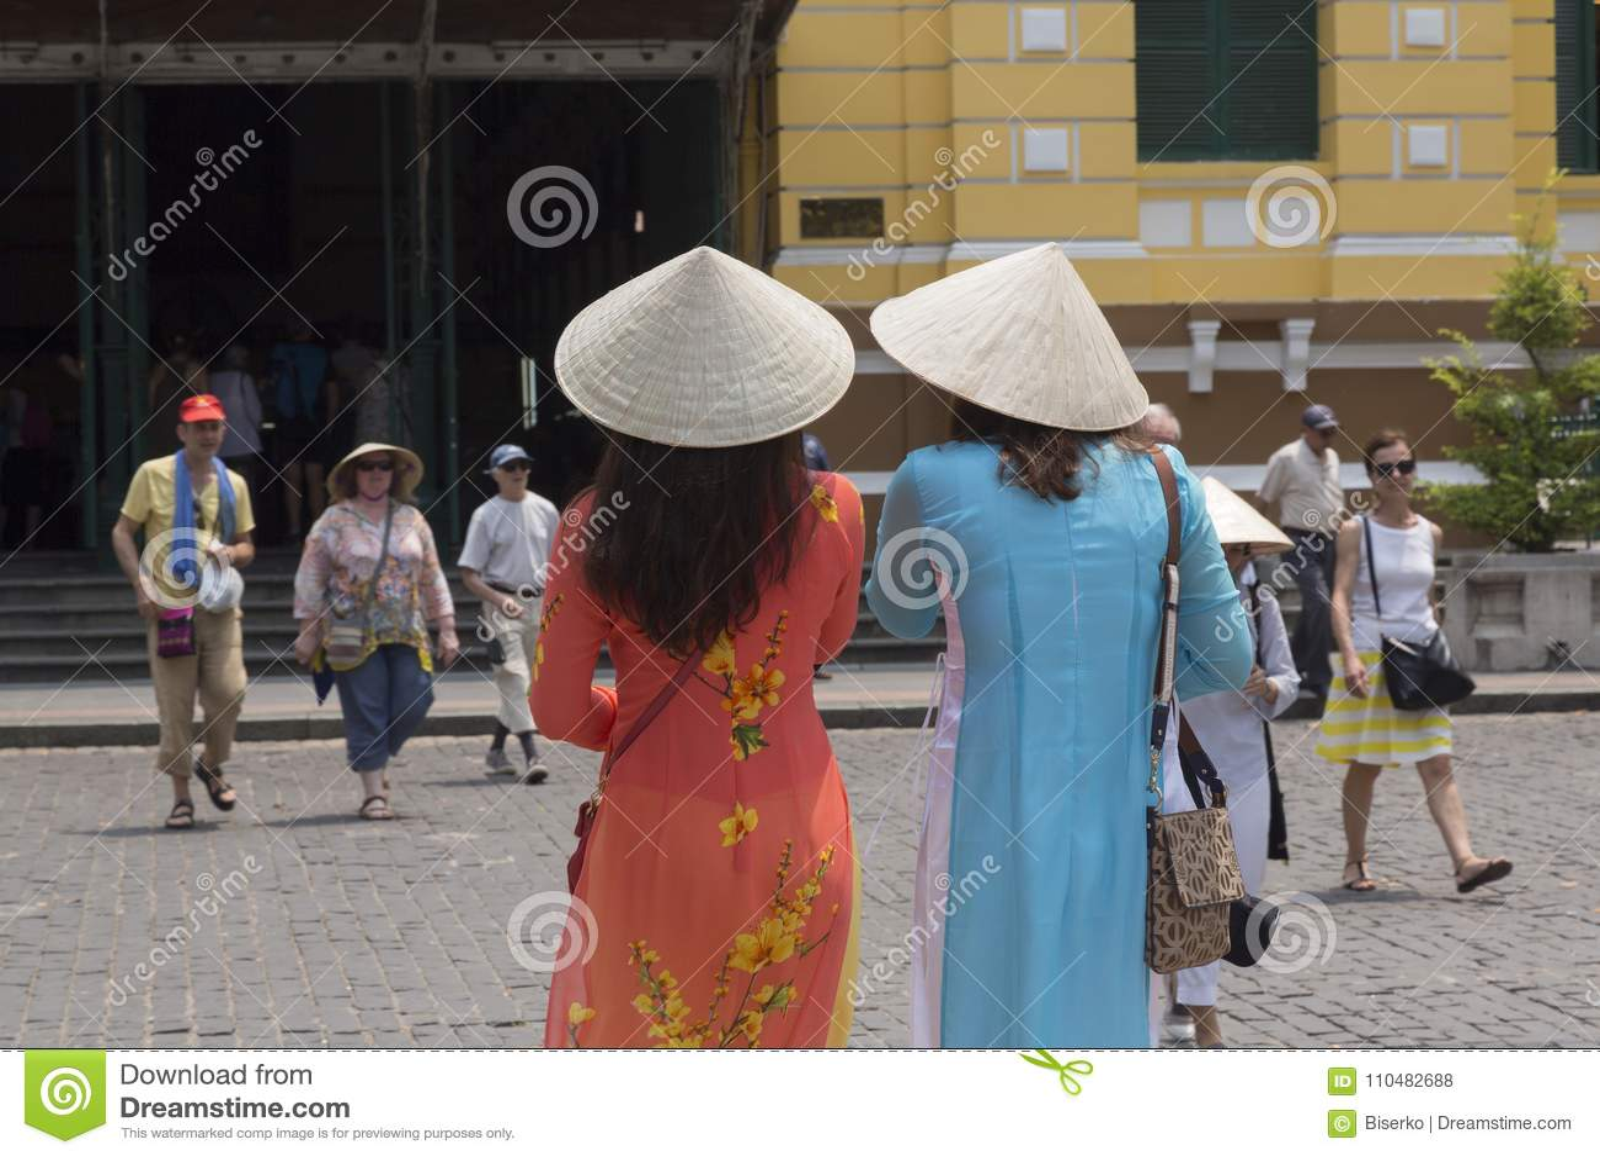 非越南傳統帽子la 庫存照片 - Download 111 Royalty Free Photos